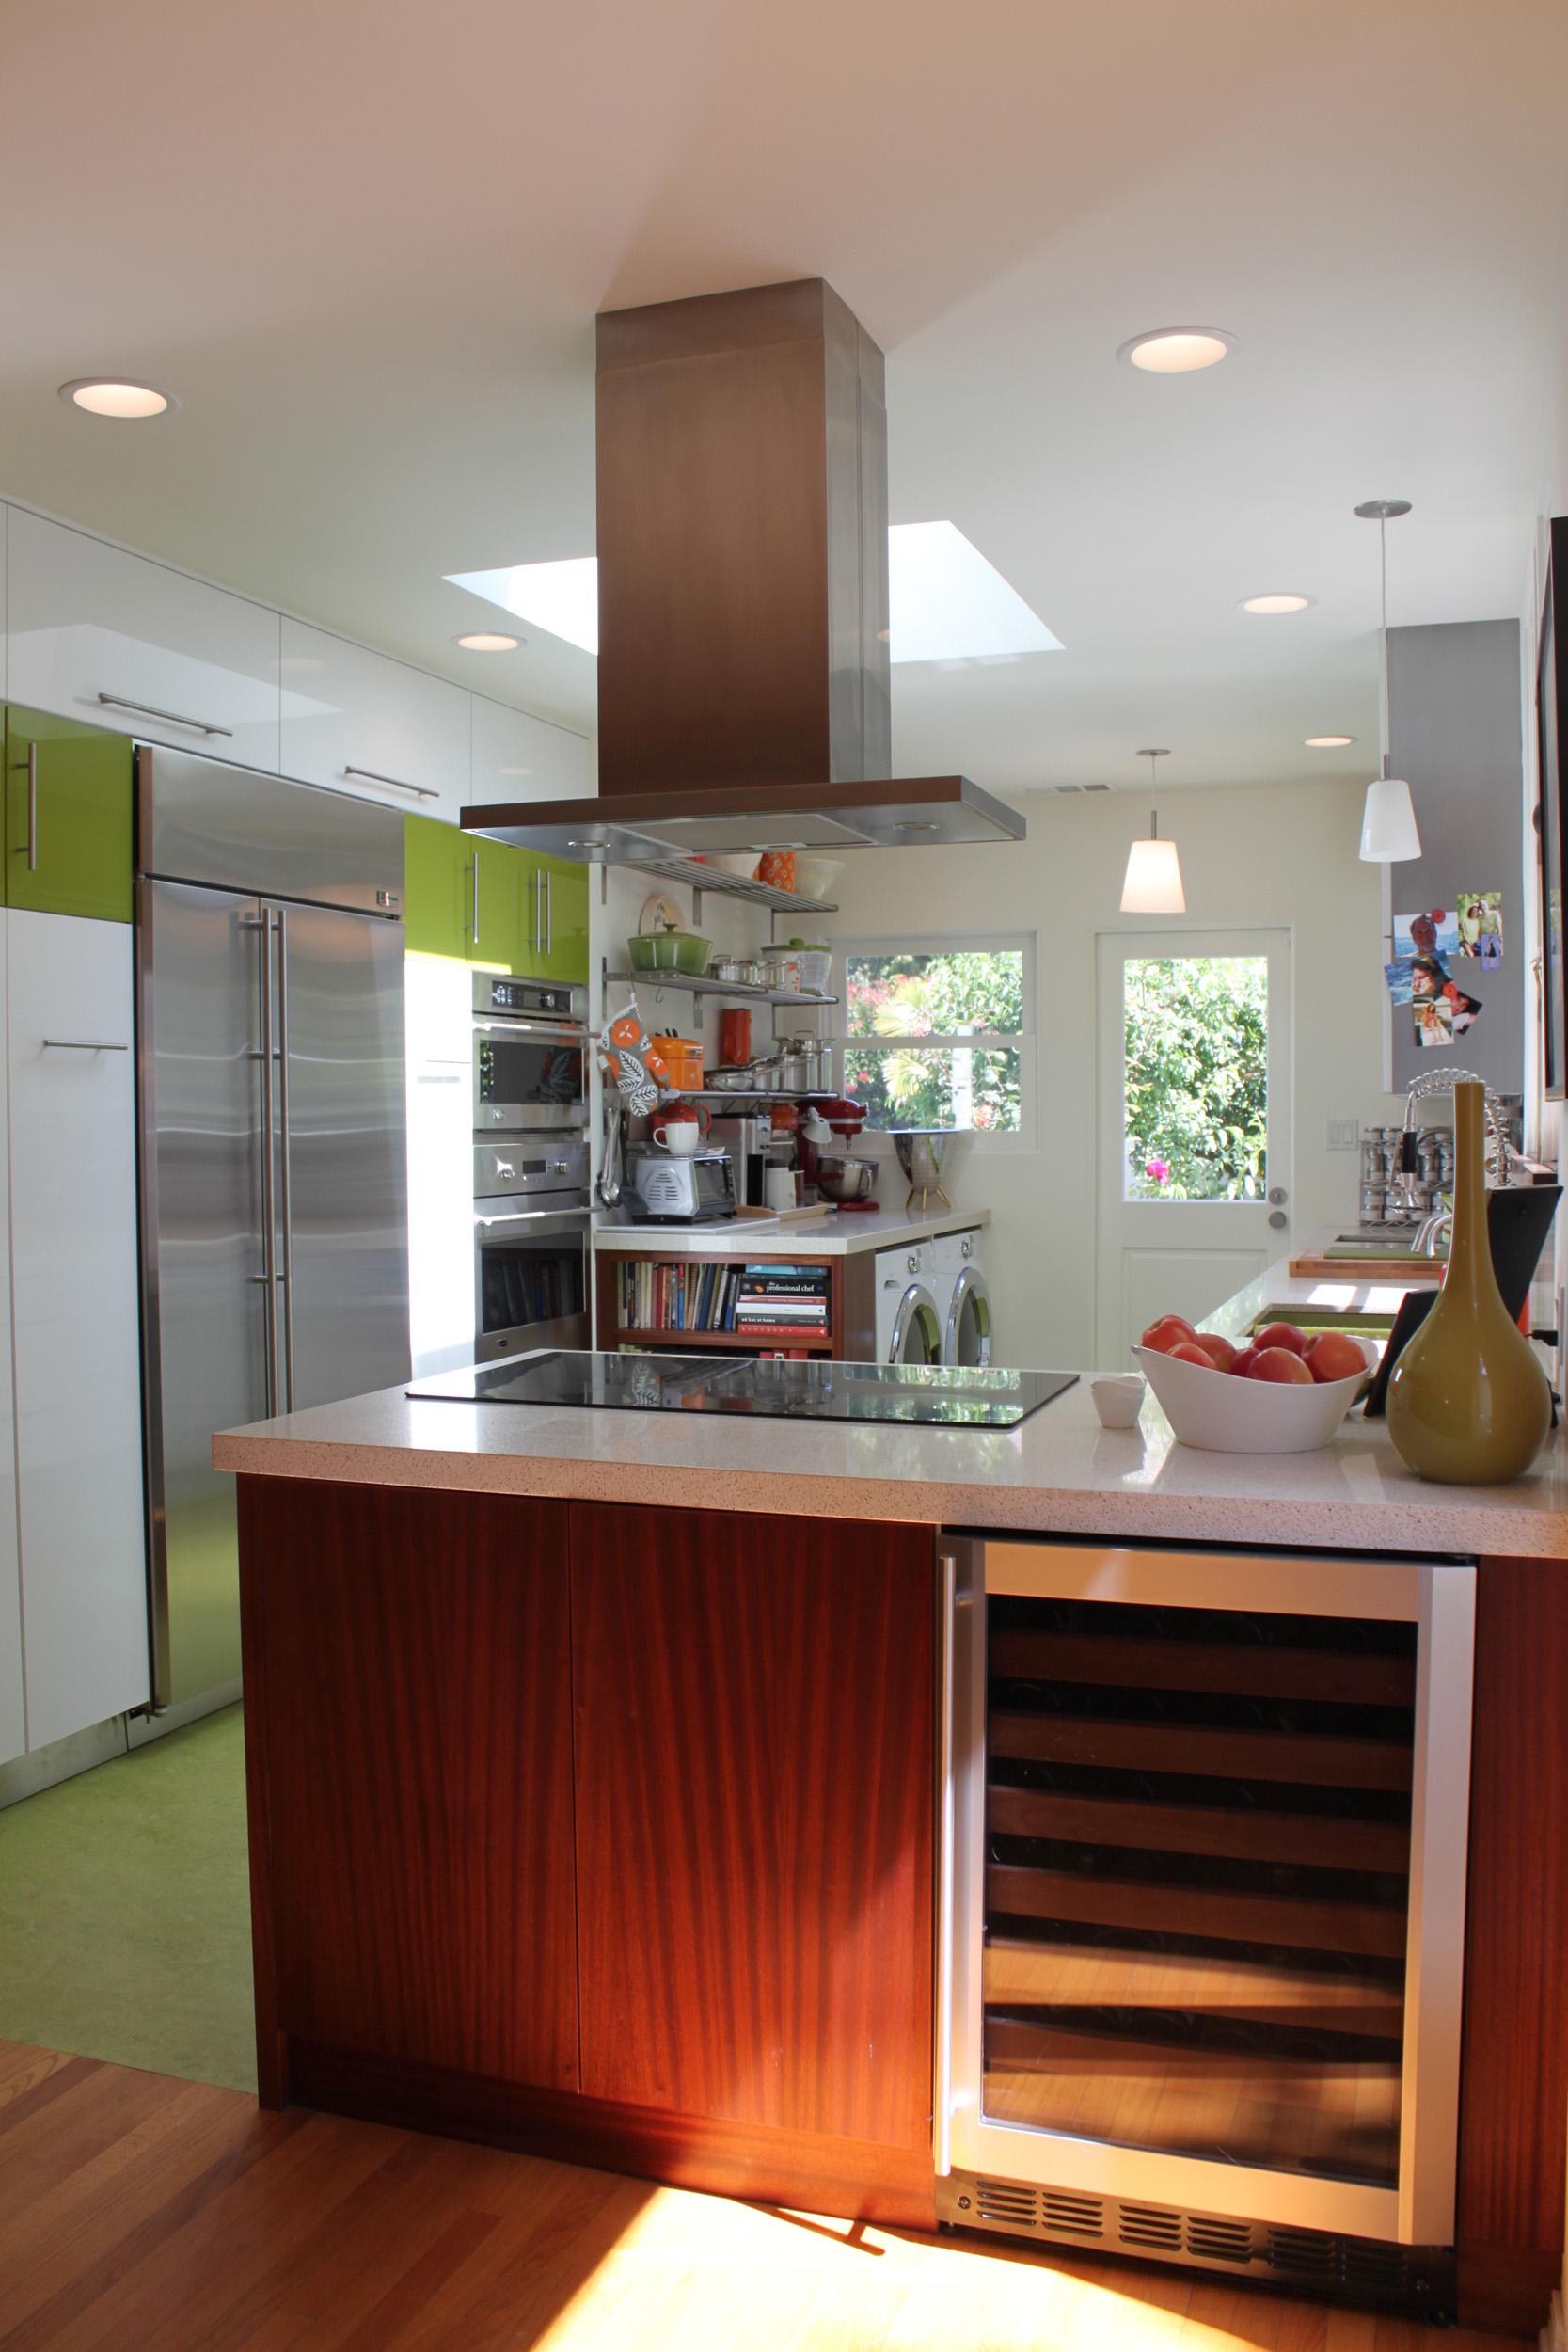 Colorful-Modern-Kitchen-Wine-Cooler-Wood-Peninsula-Cooktop-Hood.JPG